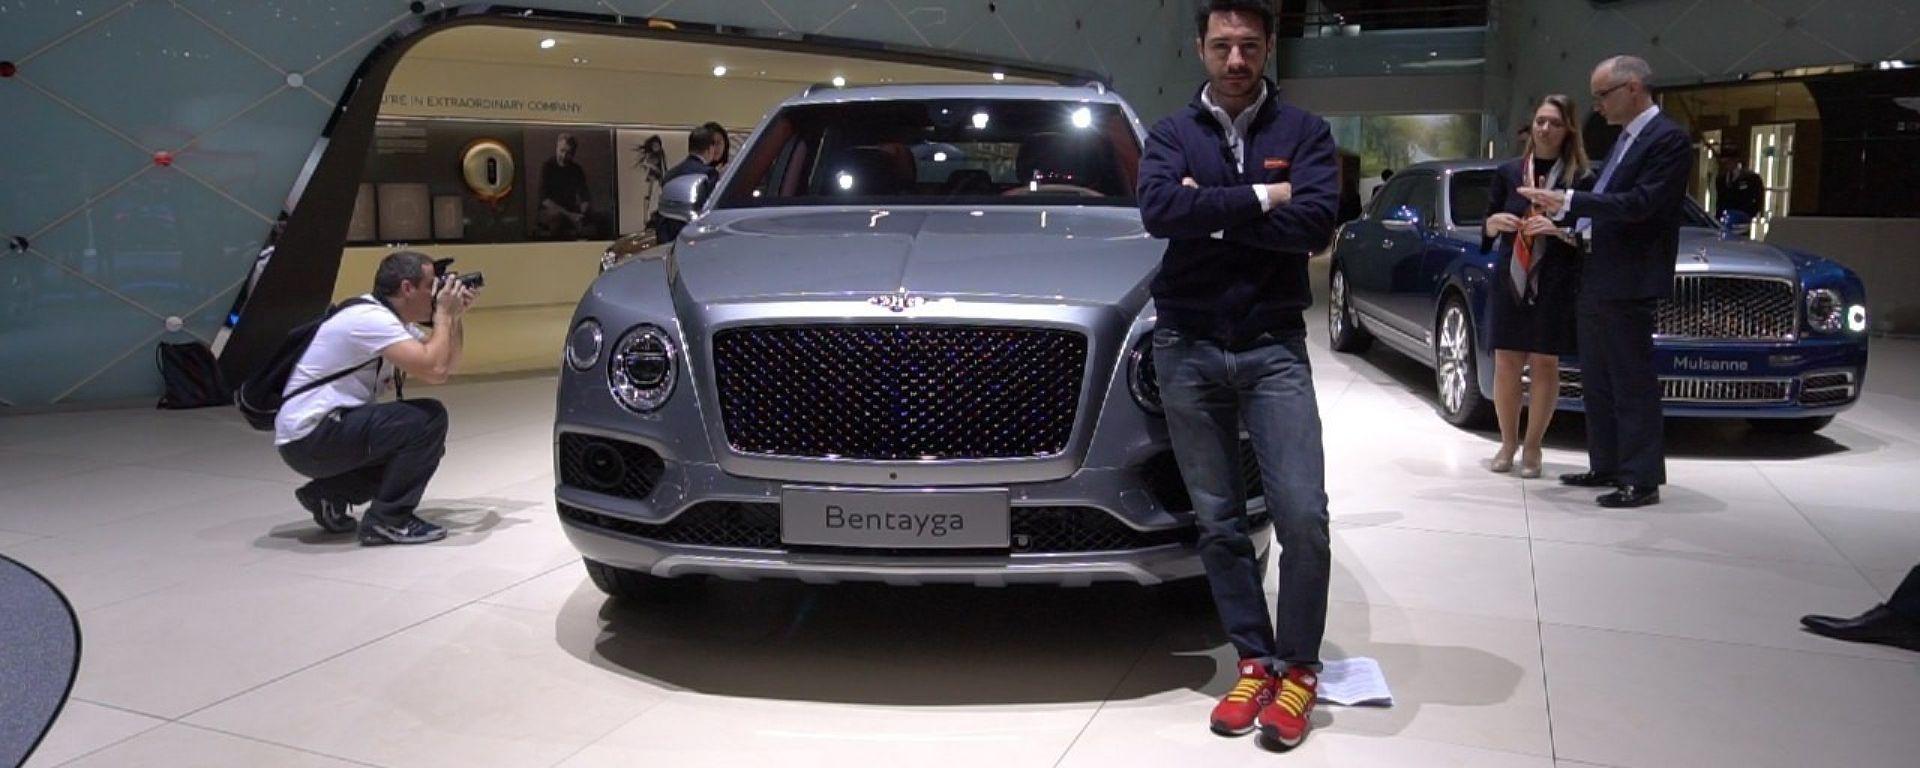 Bentley Bentayga, Salone di Ginevra 2018